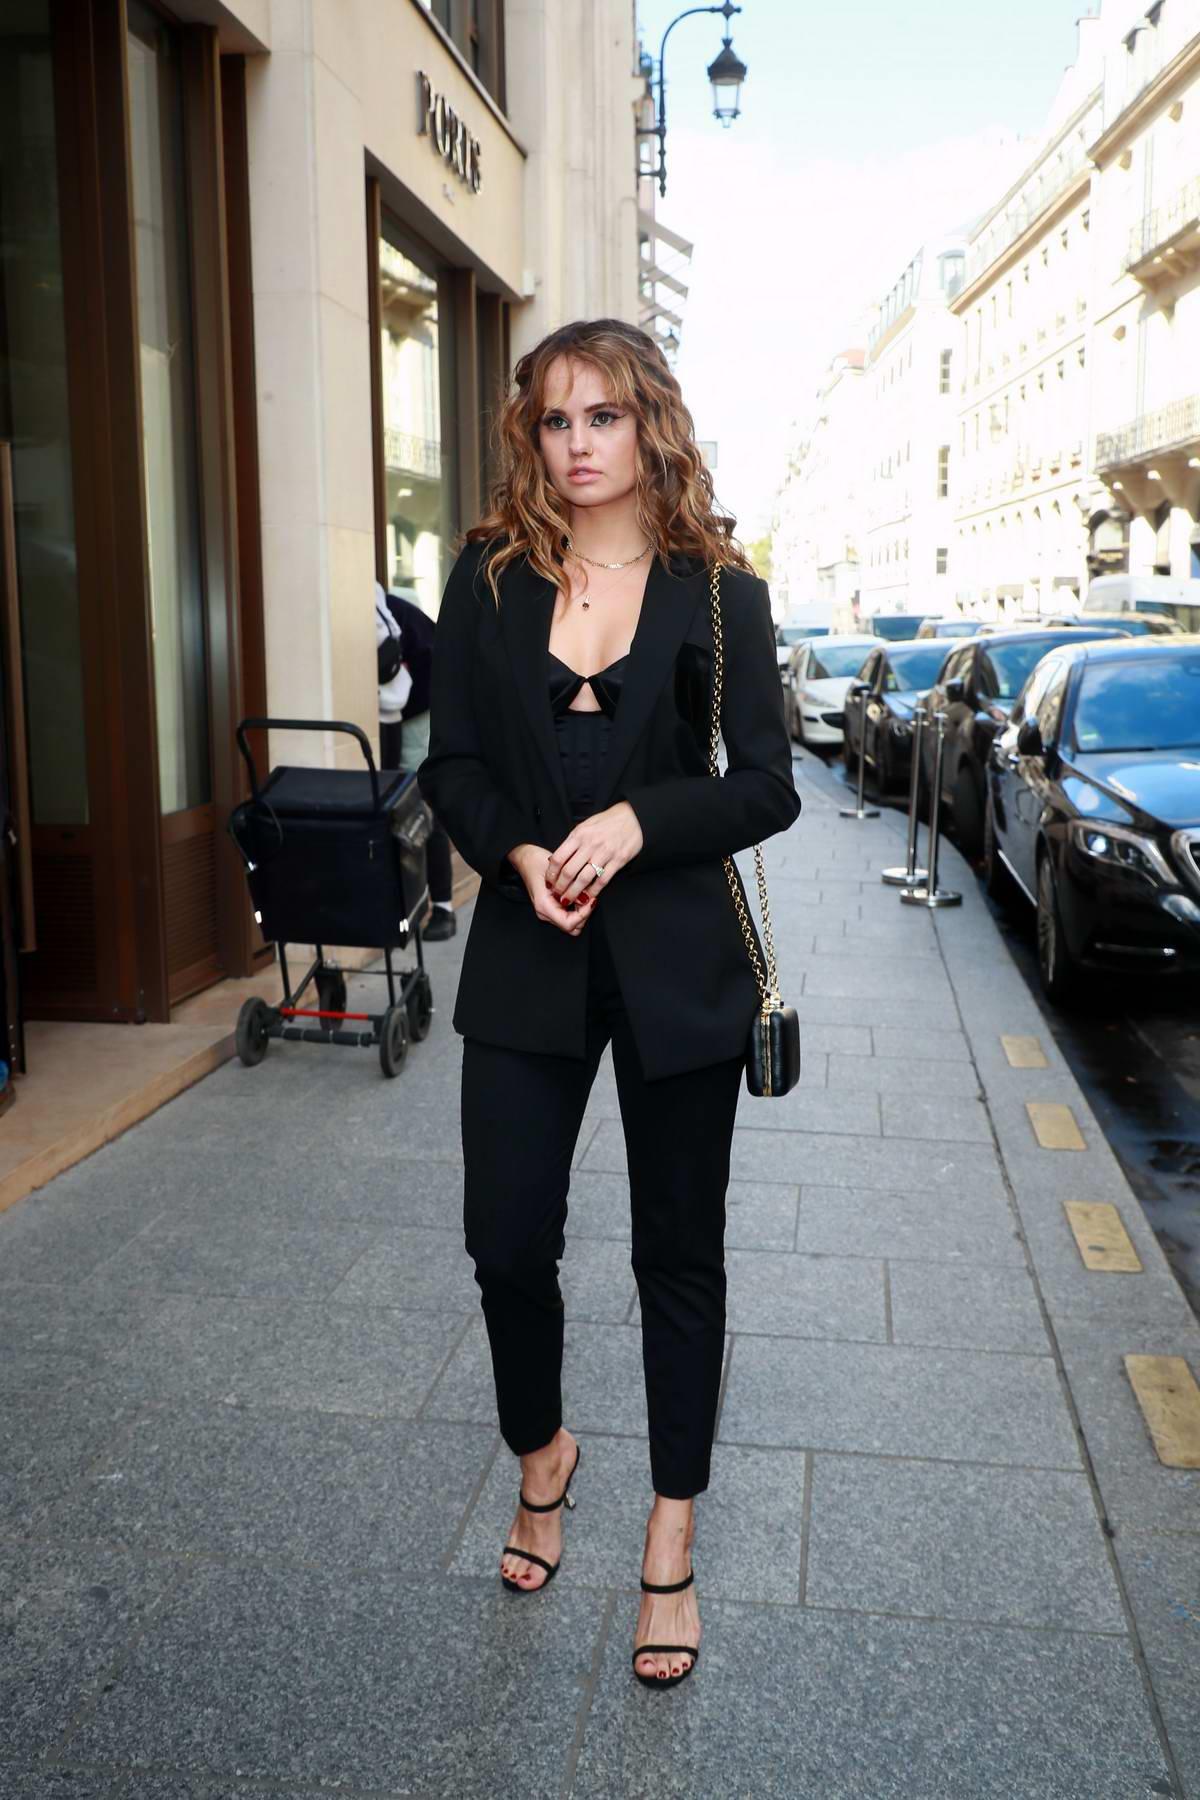 Debby Ryan attends the Balmain Womenswear Spring/Summer 2020 during Paris Fashion Week in Paris, France